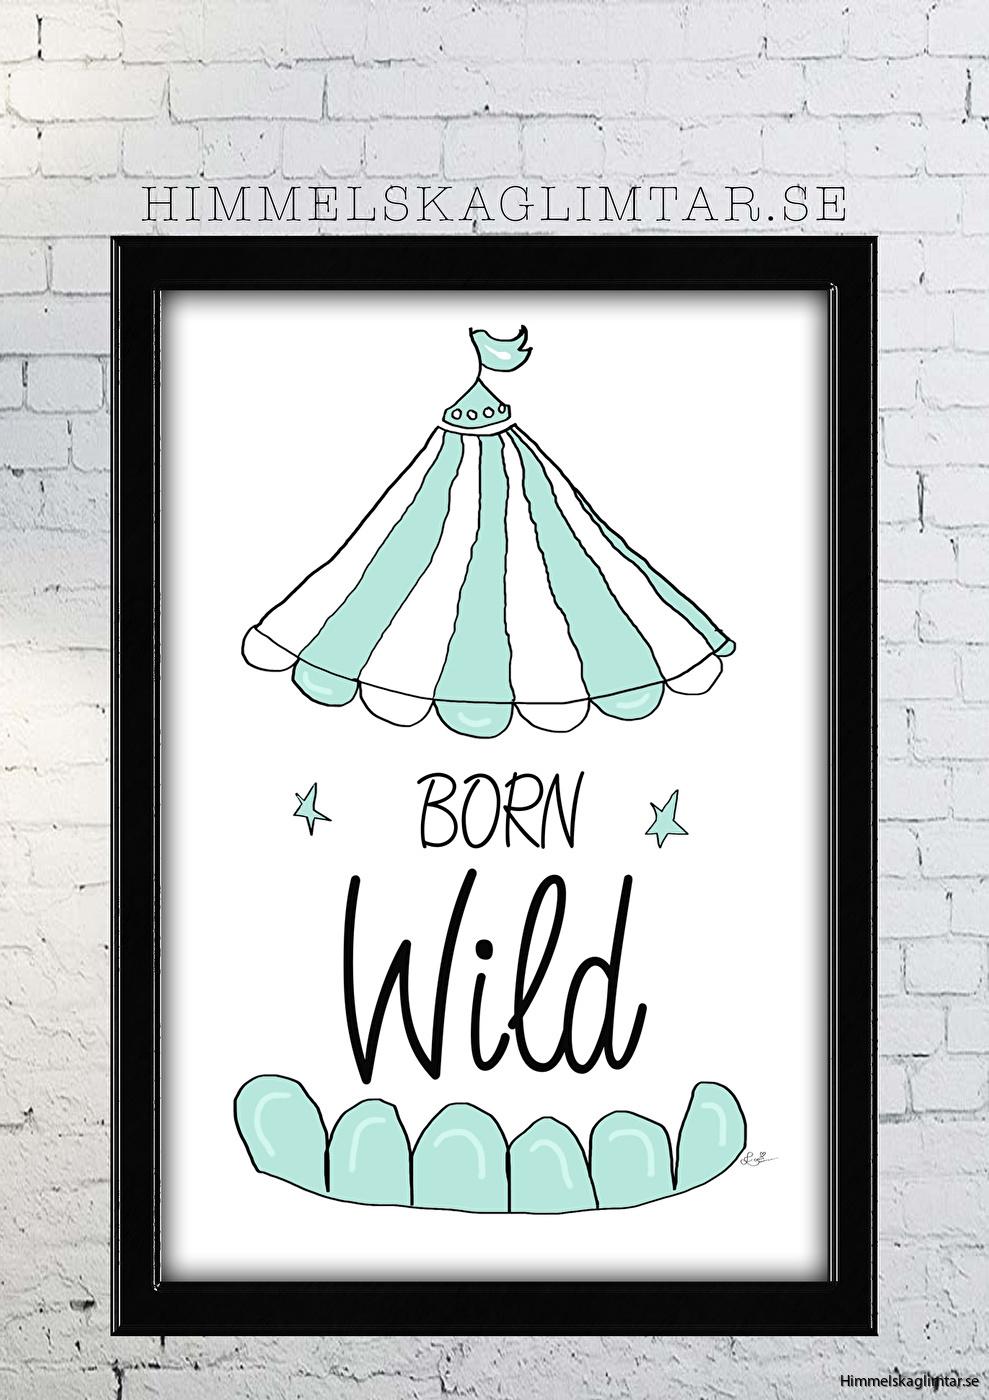 barnrum-barnrumsinredning-barnposter-poster-himmelskaglimtar-born wild-circus-pojkrum